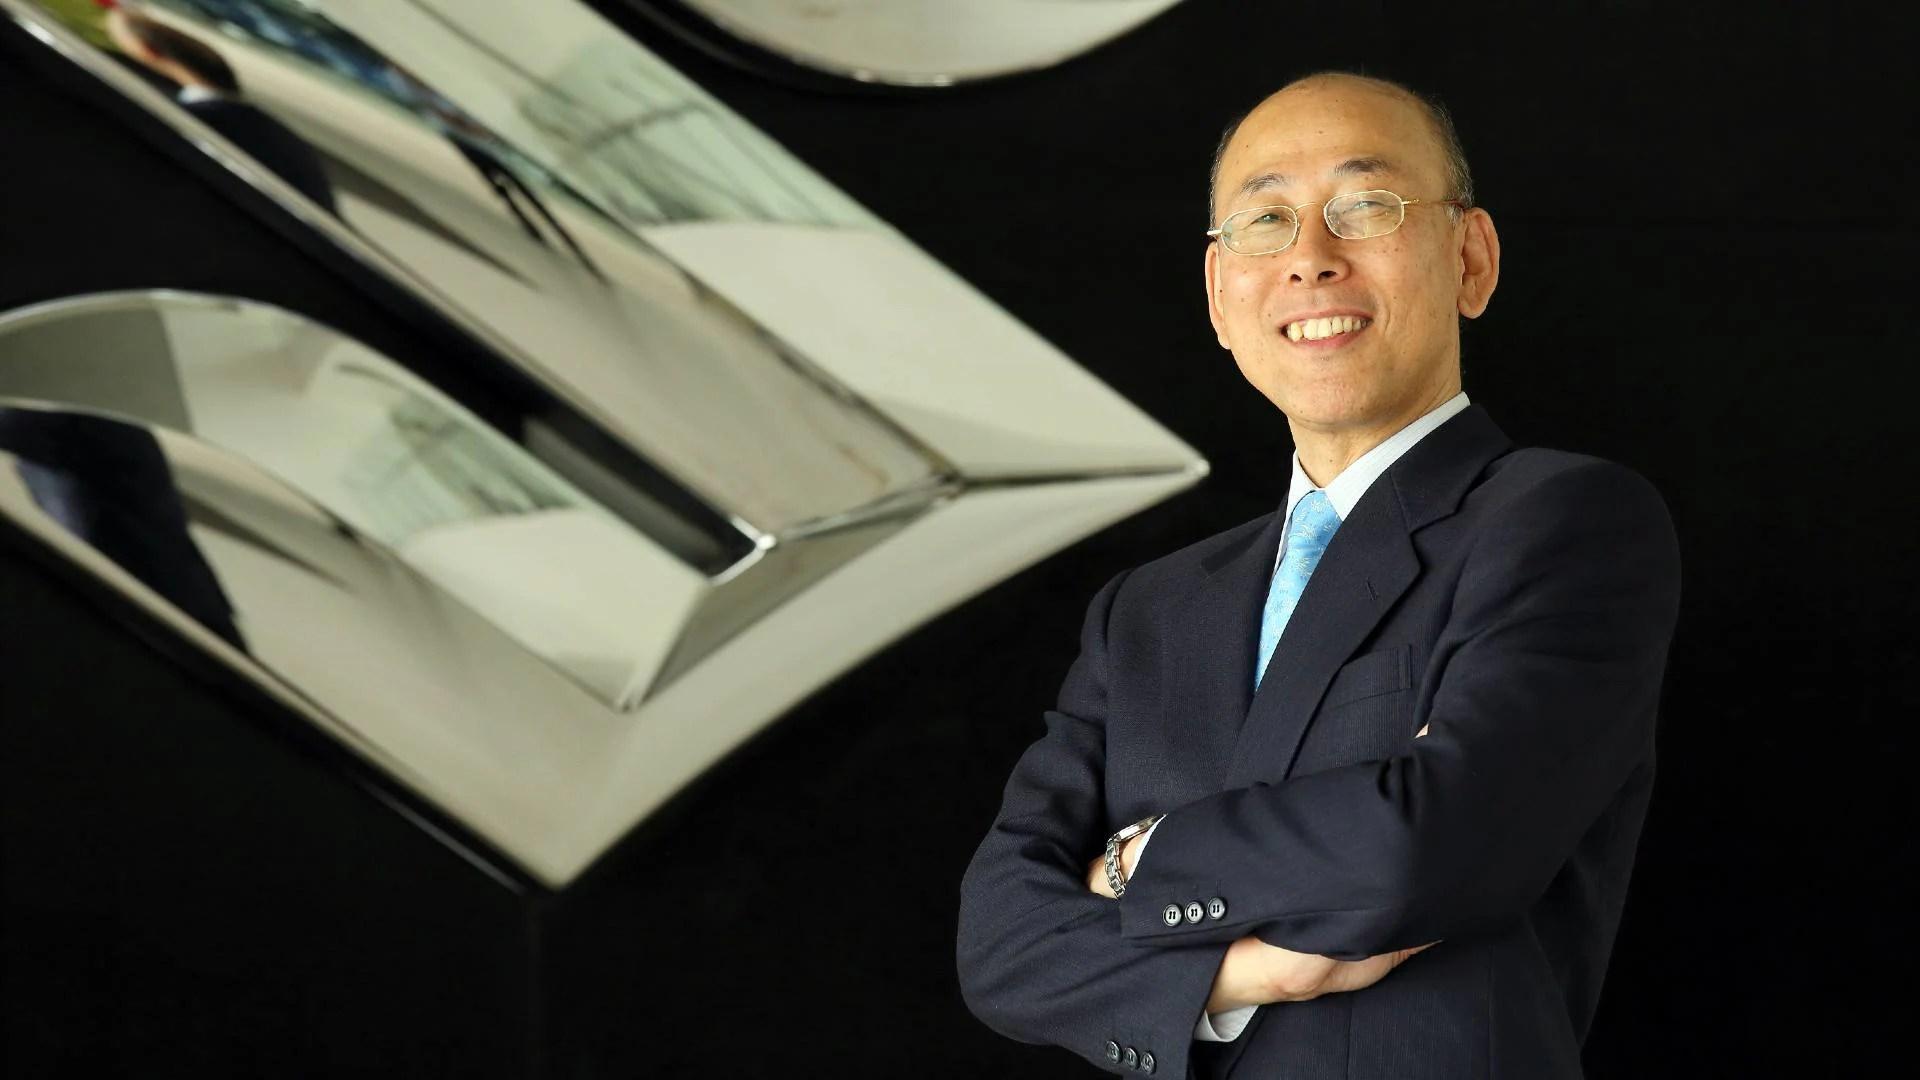 Satoshi Uchida succeeds Koichiro Hirao as the company head at Suzuki Motorcycle India- Technology News, Gadgetclock